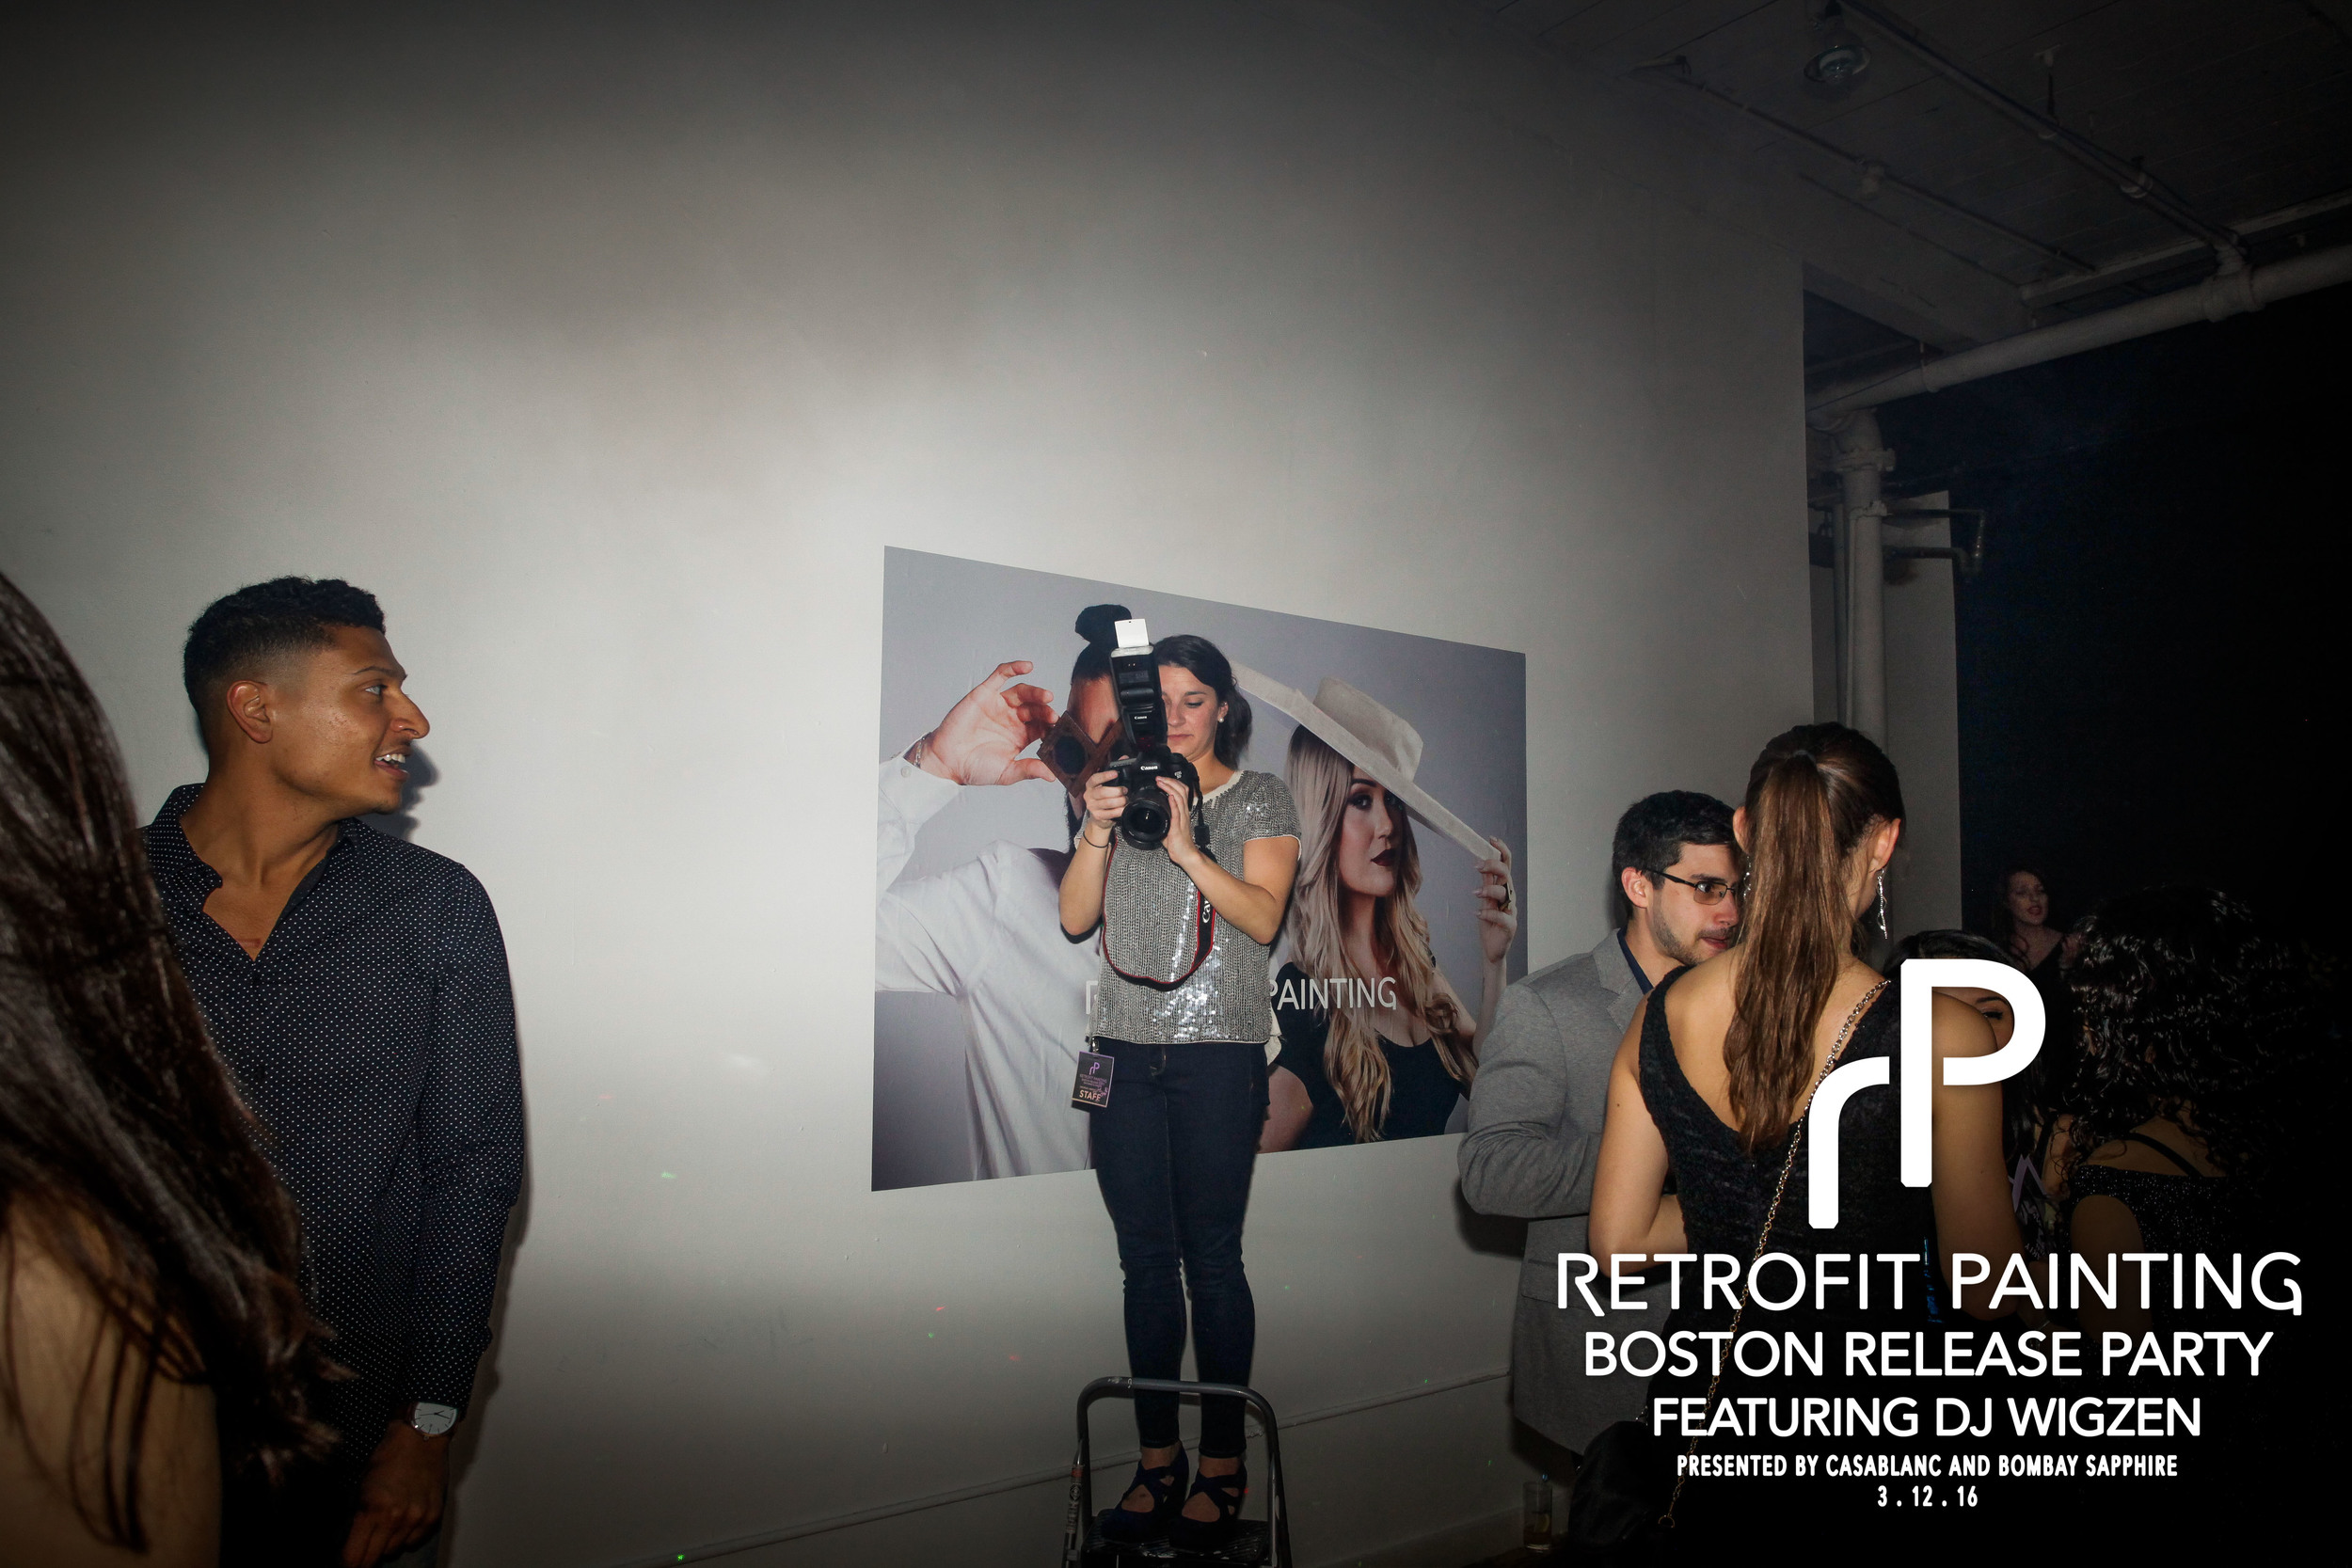 Retrofit Painting Boston Release Party 0108.jpg